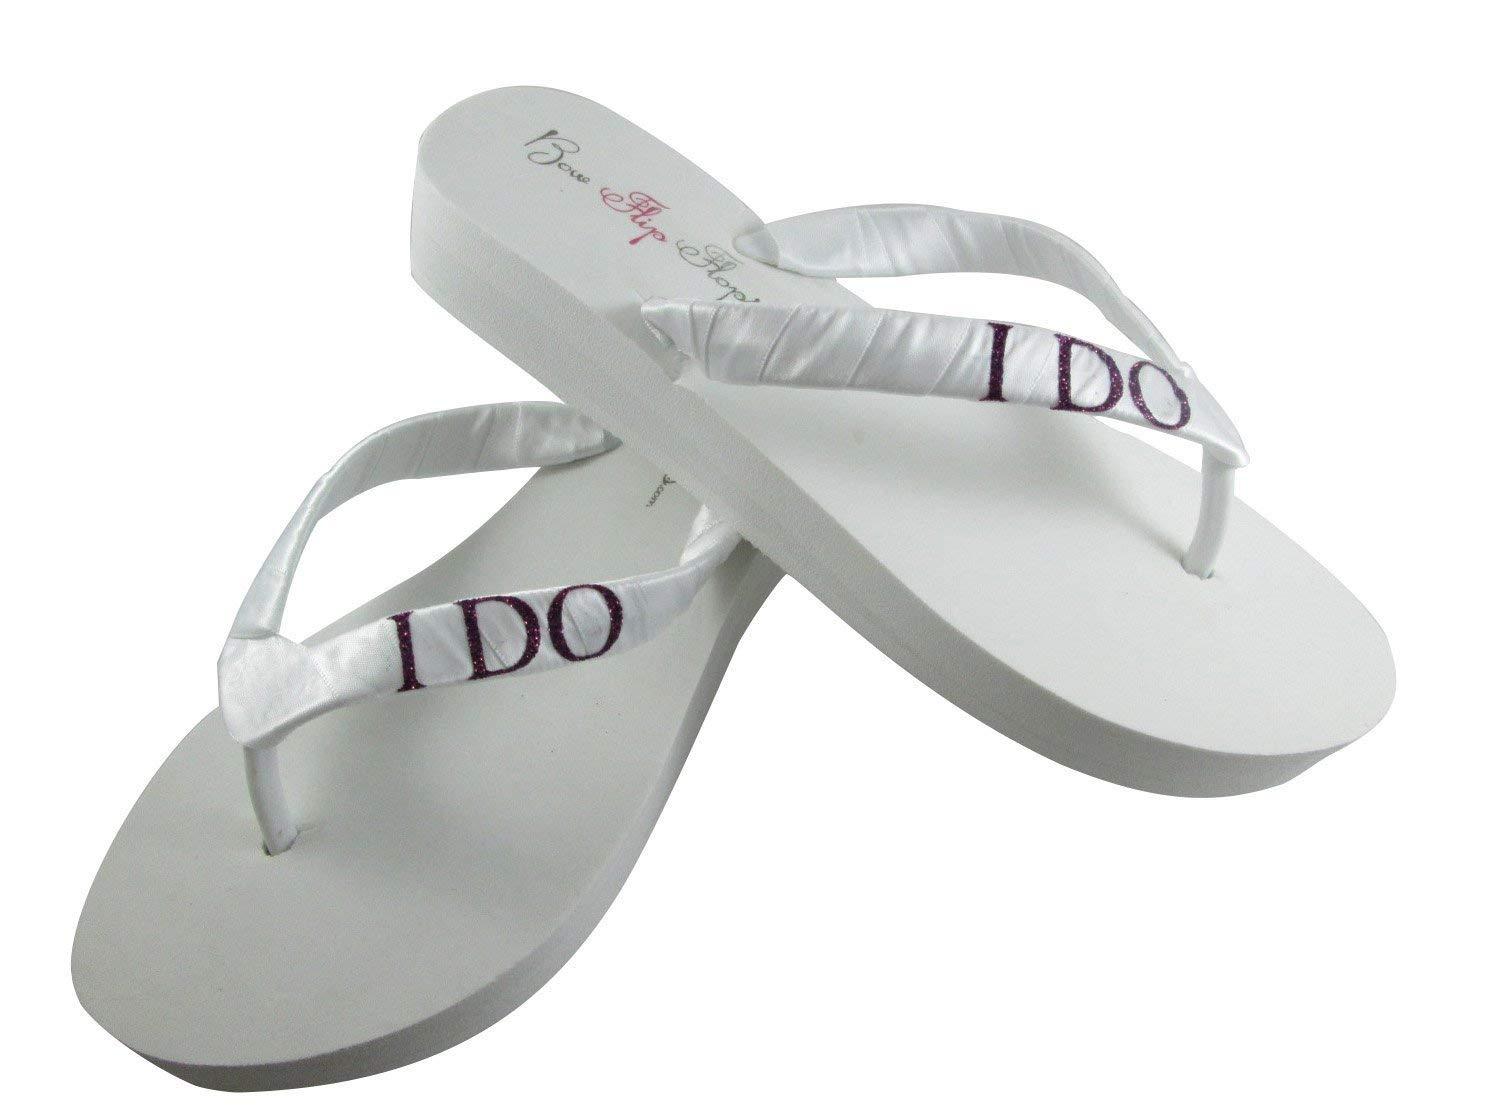 92beab25dd7b Get Quotations · I DO Glitter Bridal Flip Flops in Ivory or White   Custom  Sparkle Color